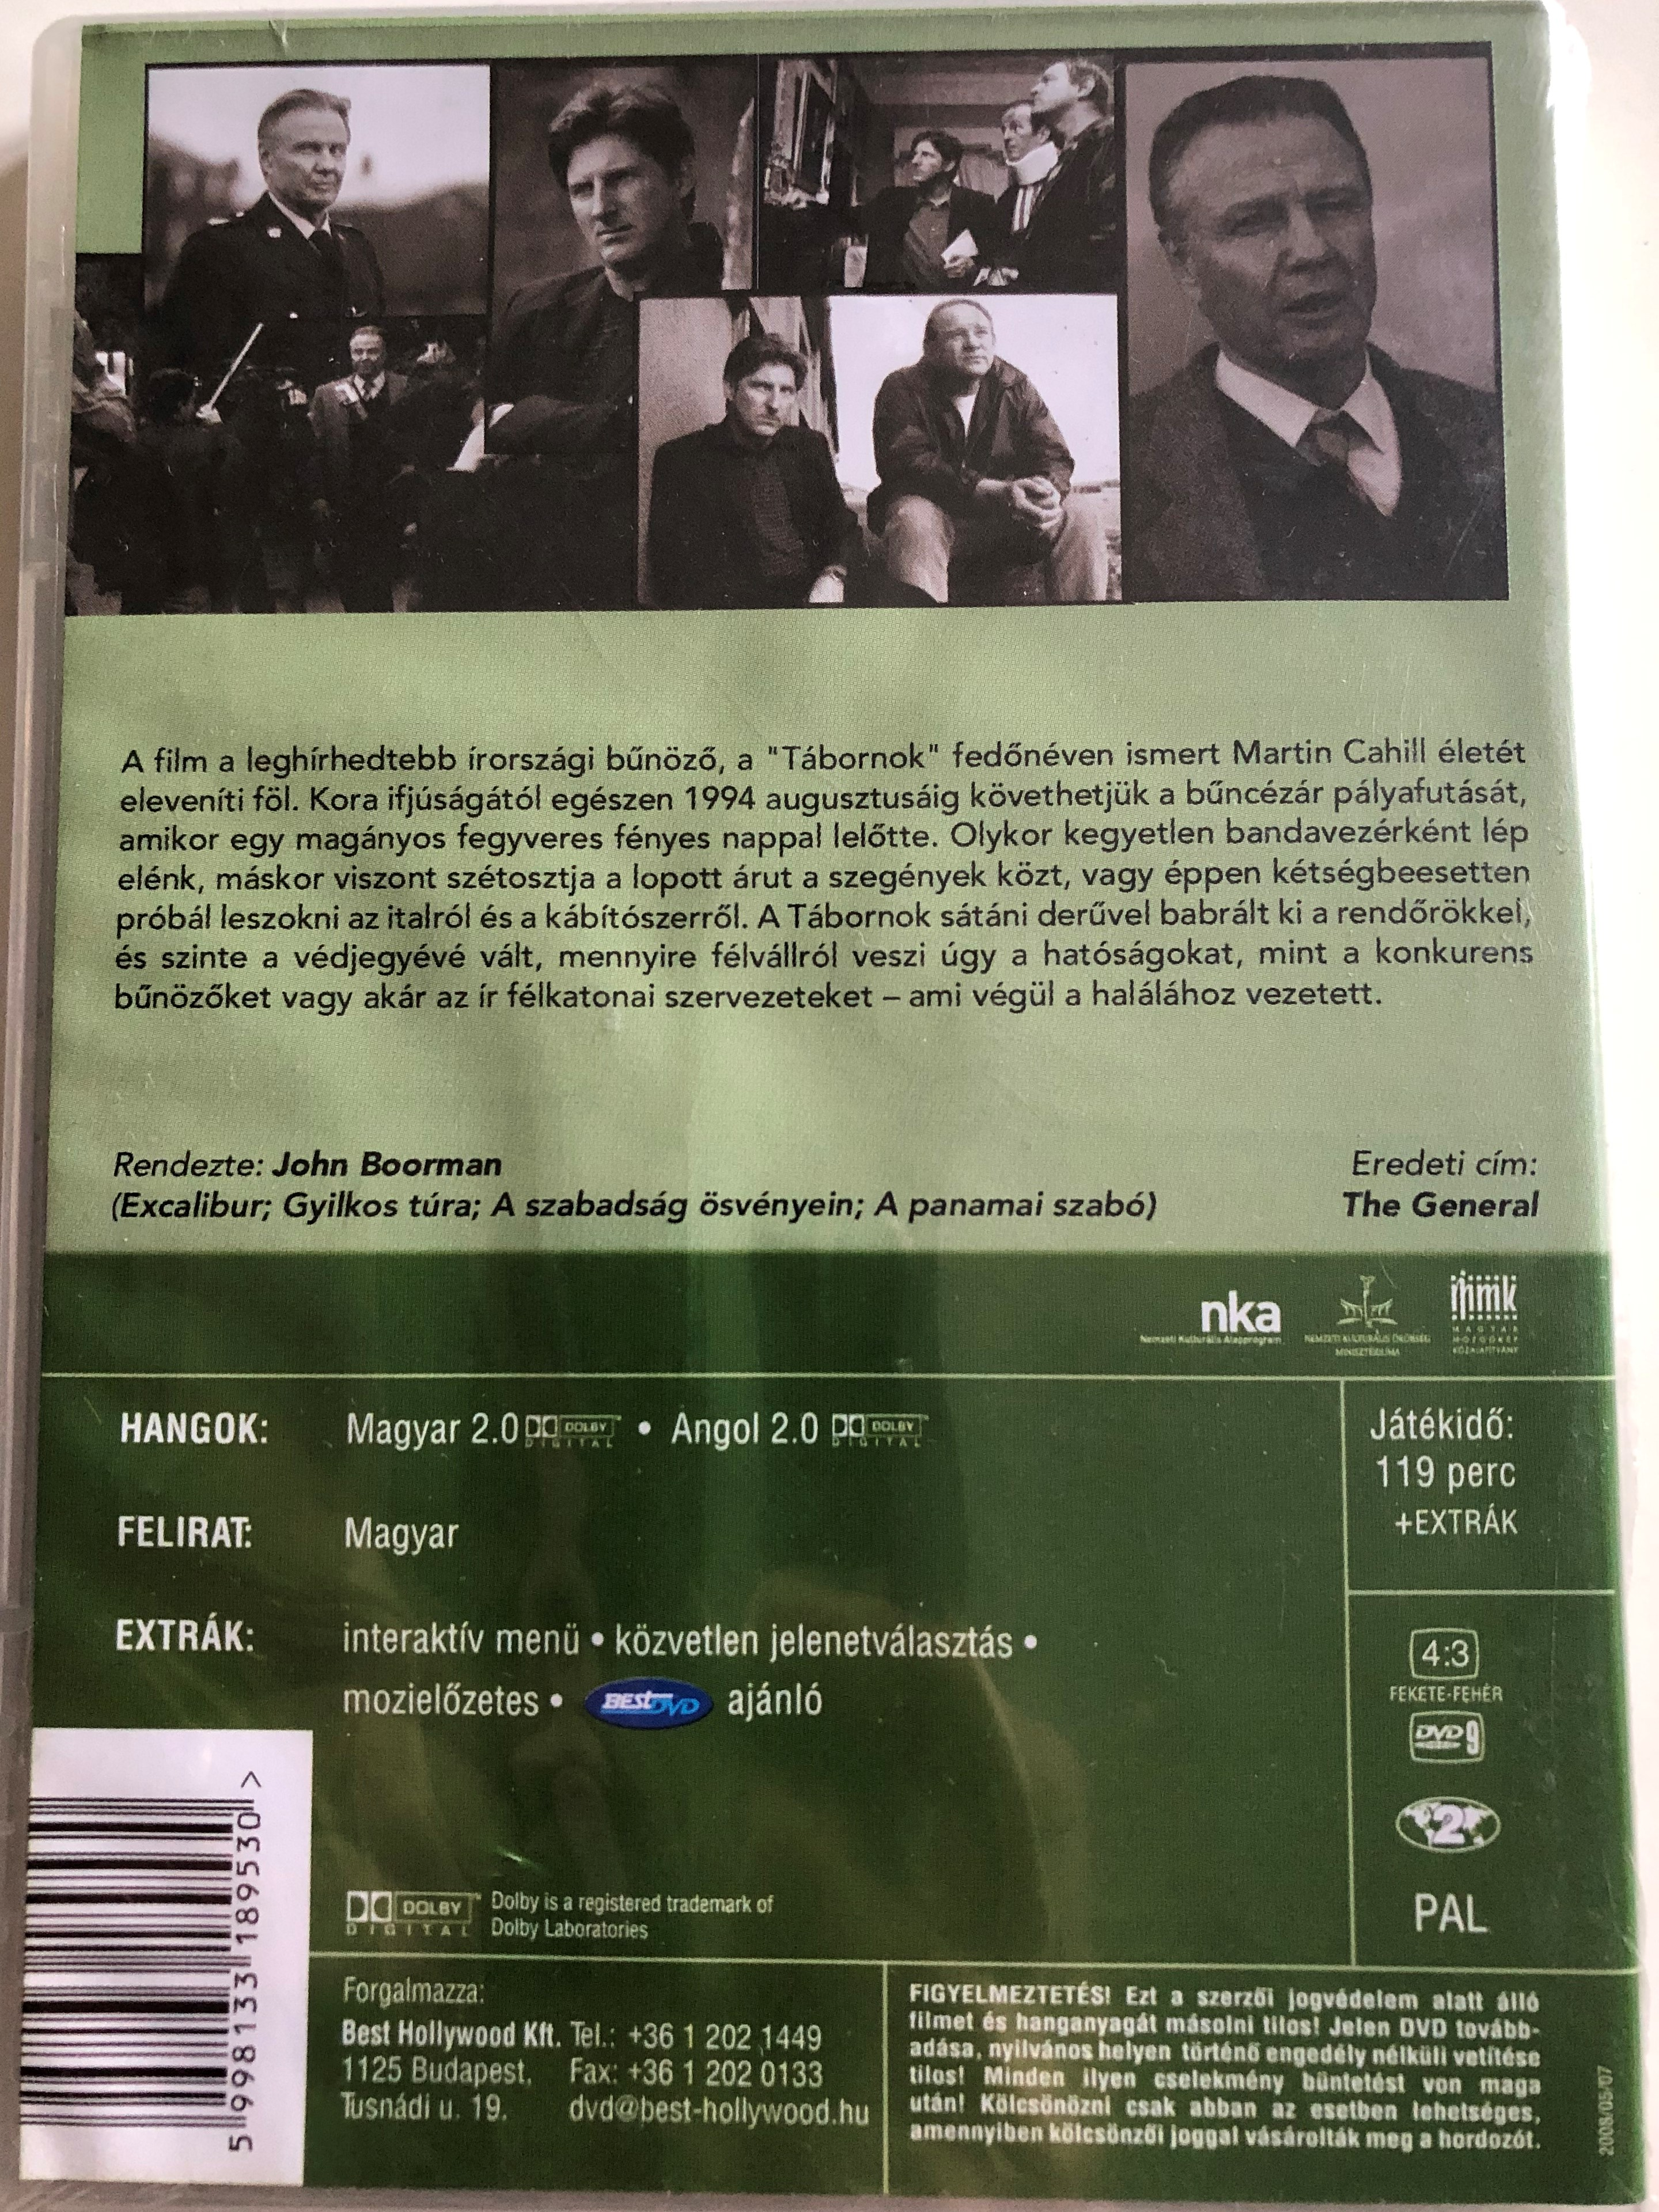 the-general-dvd-1998-a-b-nc-z-r-directed-by-john-boorman-2.jpg